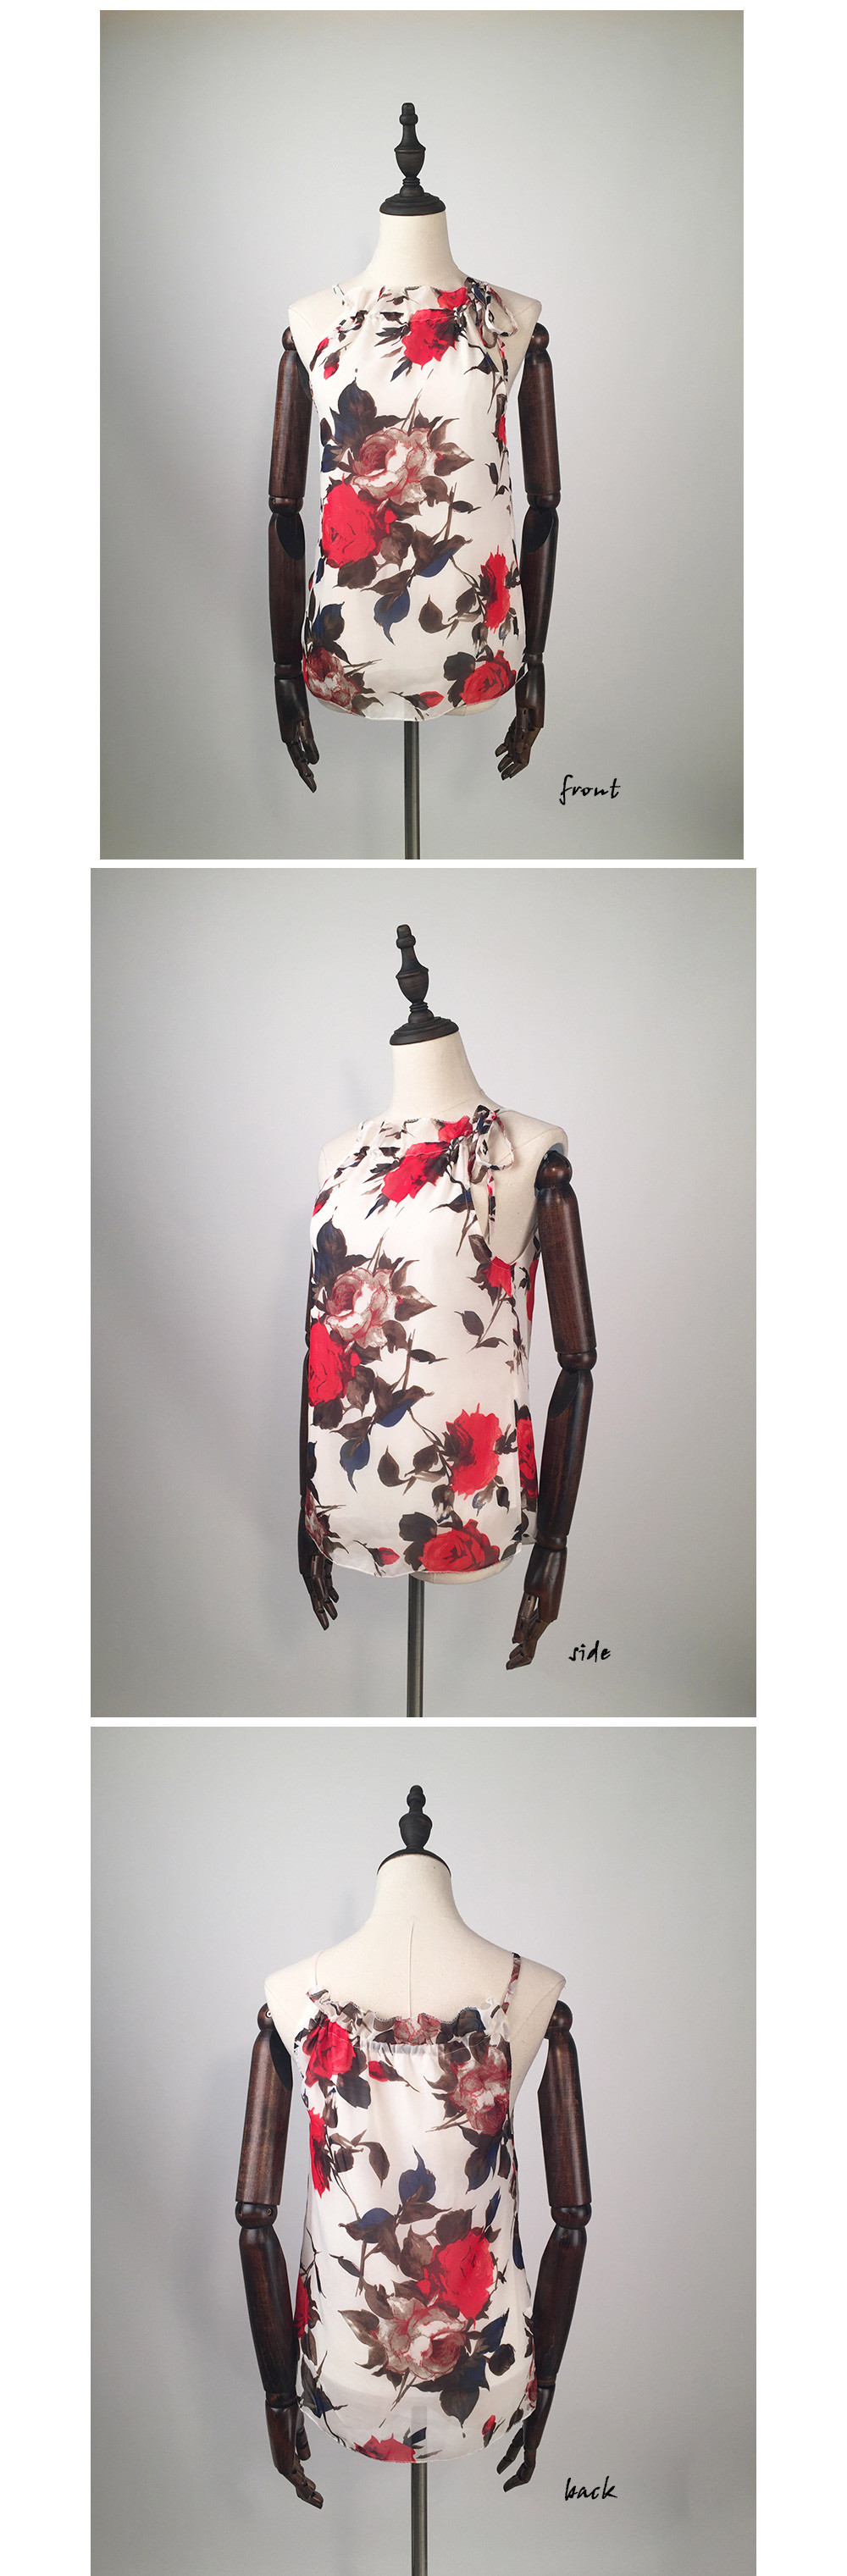 HTB1vCFUOVXXXXbgXVXXq6xXFXXX9 - New Fashion Women Sleeveless Chiffon Floral Print Blouses Tops Shirt